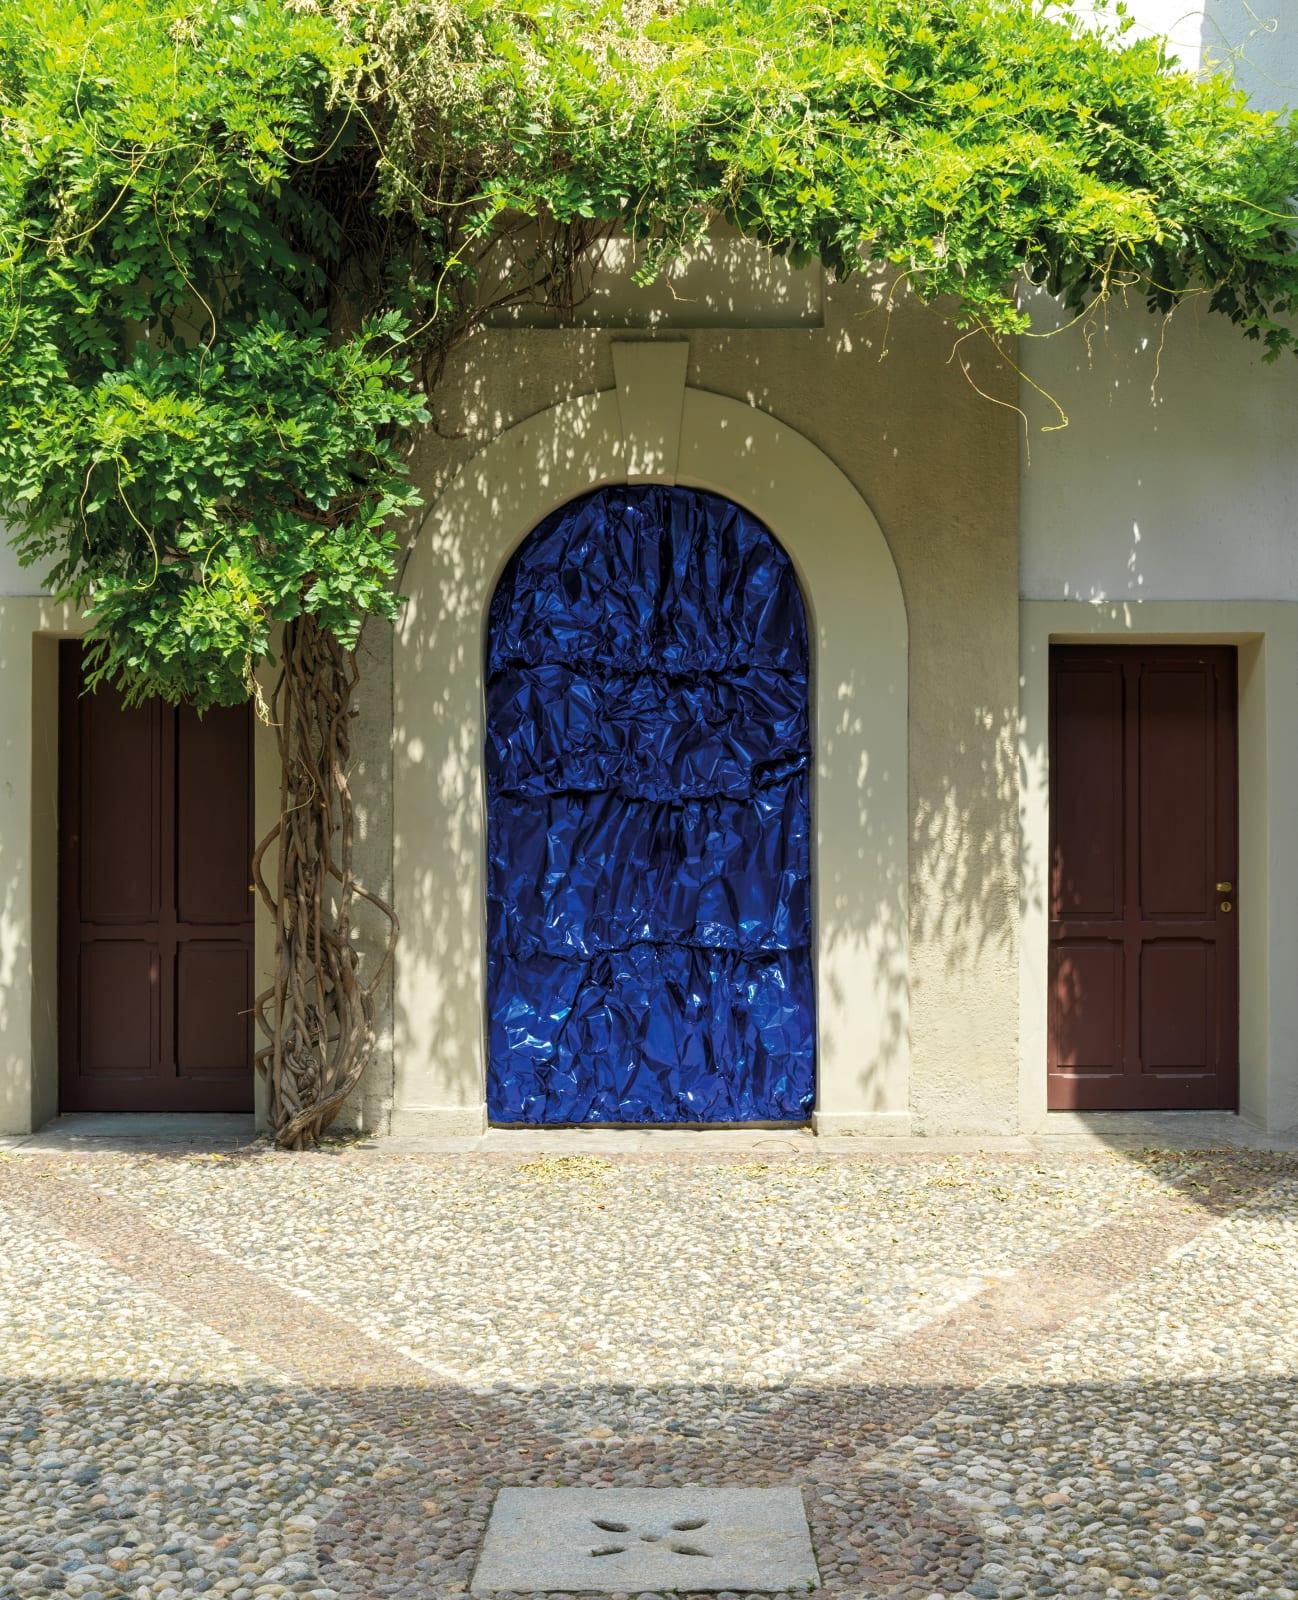 Tiziana Lorenzelli, Cobalt Blue Installation, 2021